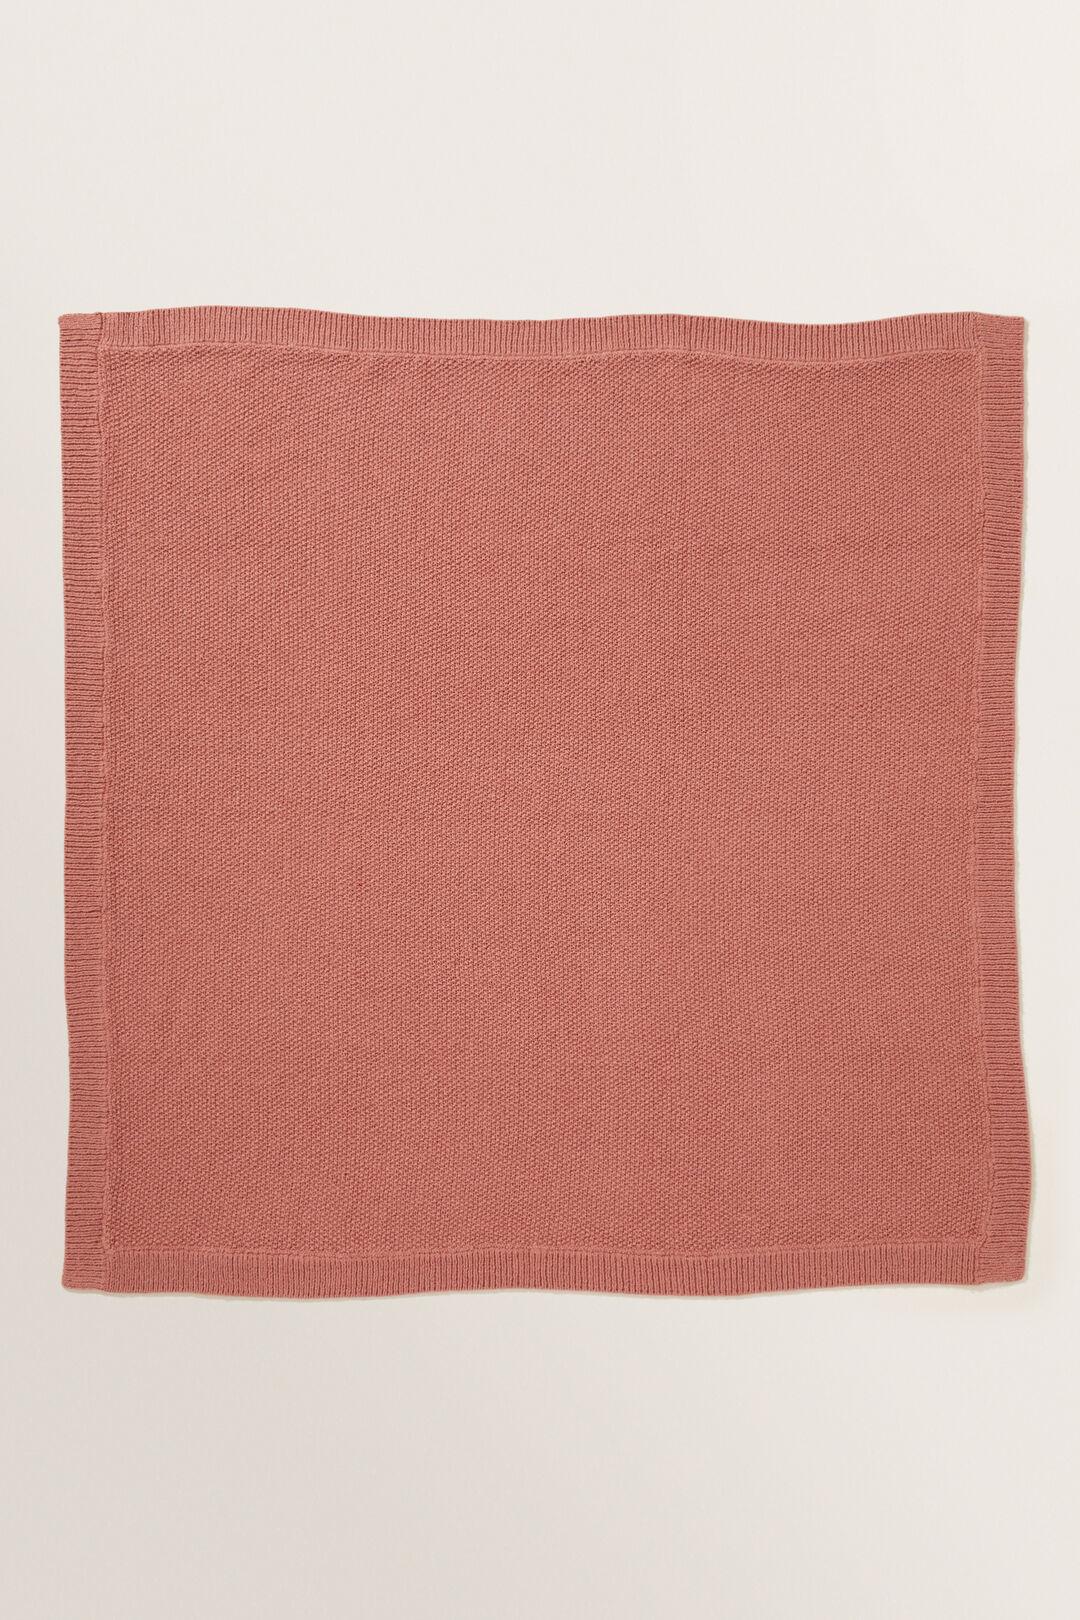 Textured Knit Blanket  Faded Rose  hi-res